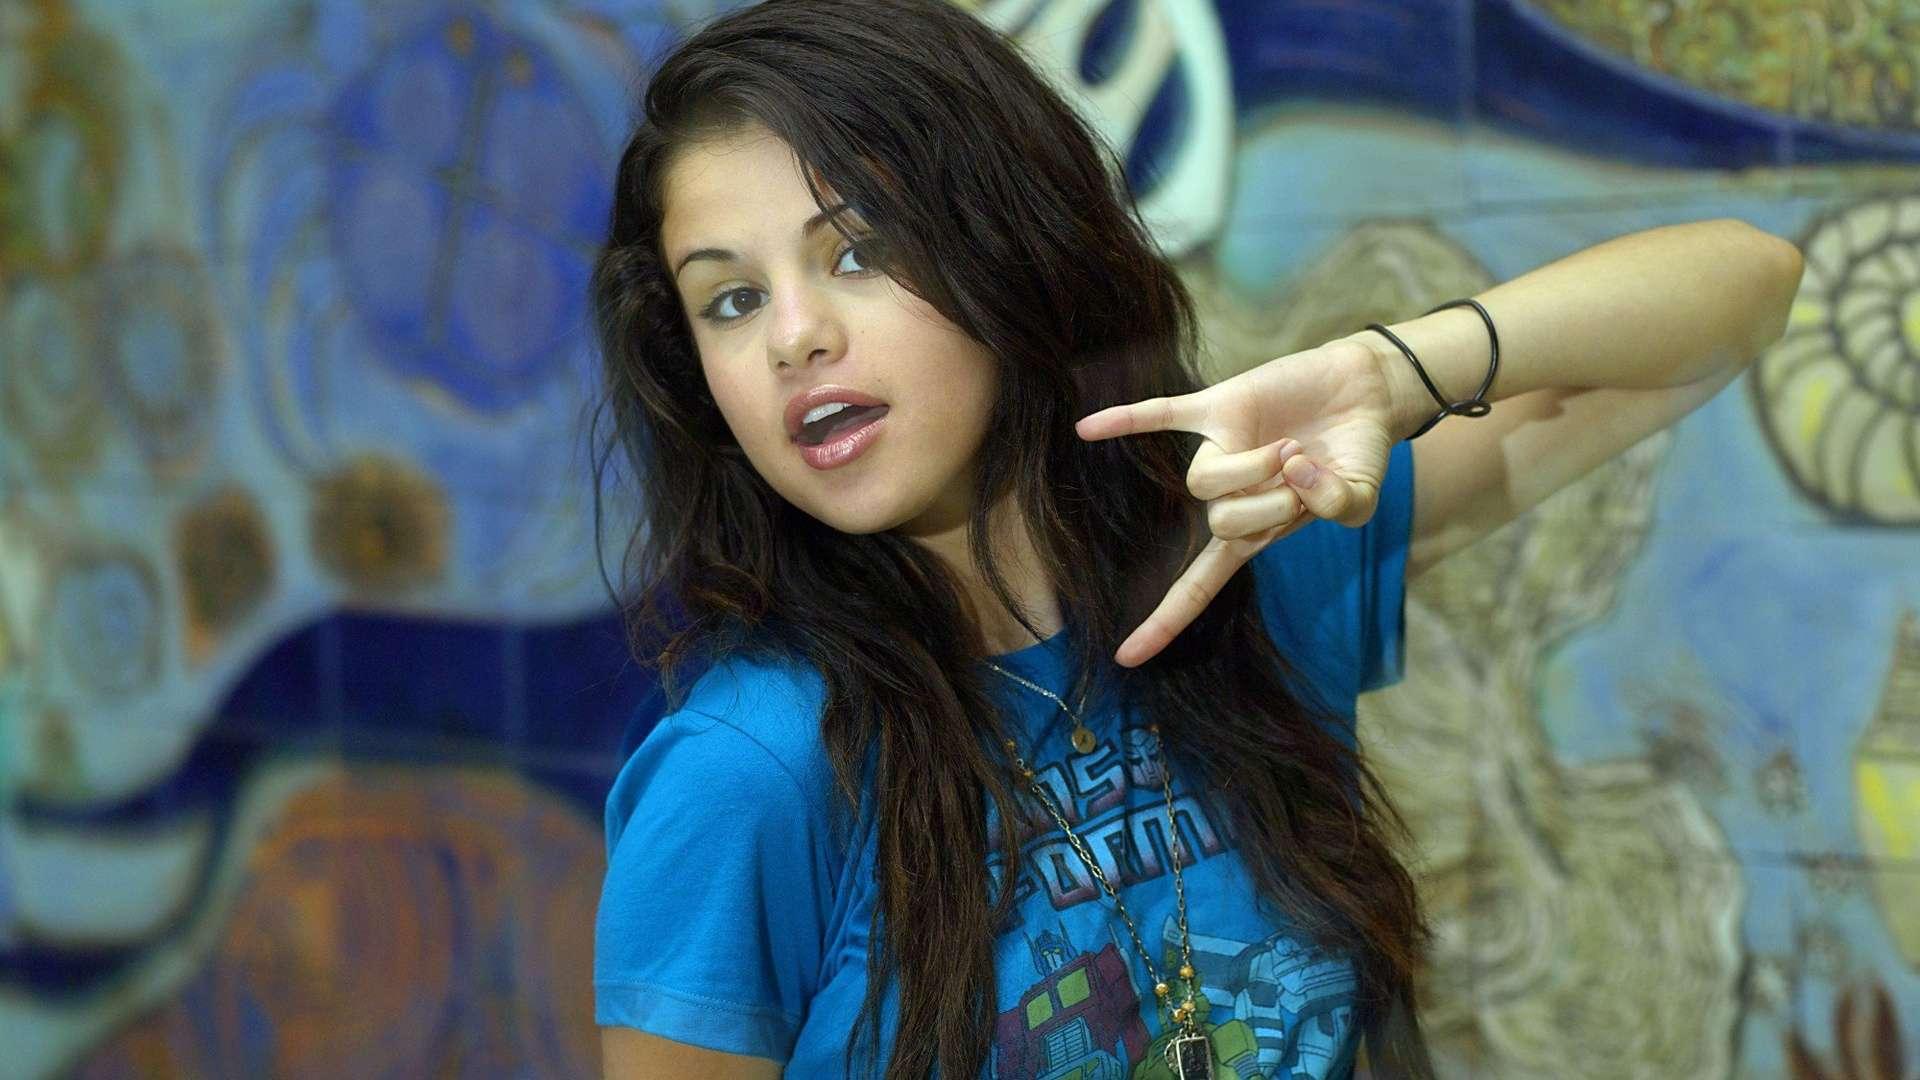 Hd Wallpapers Selena Gomez Hd Wallpapers